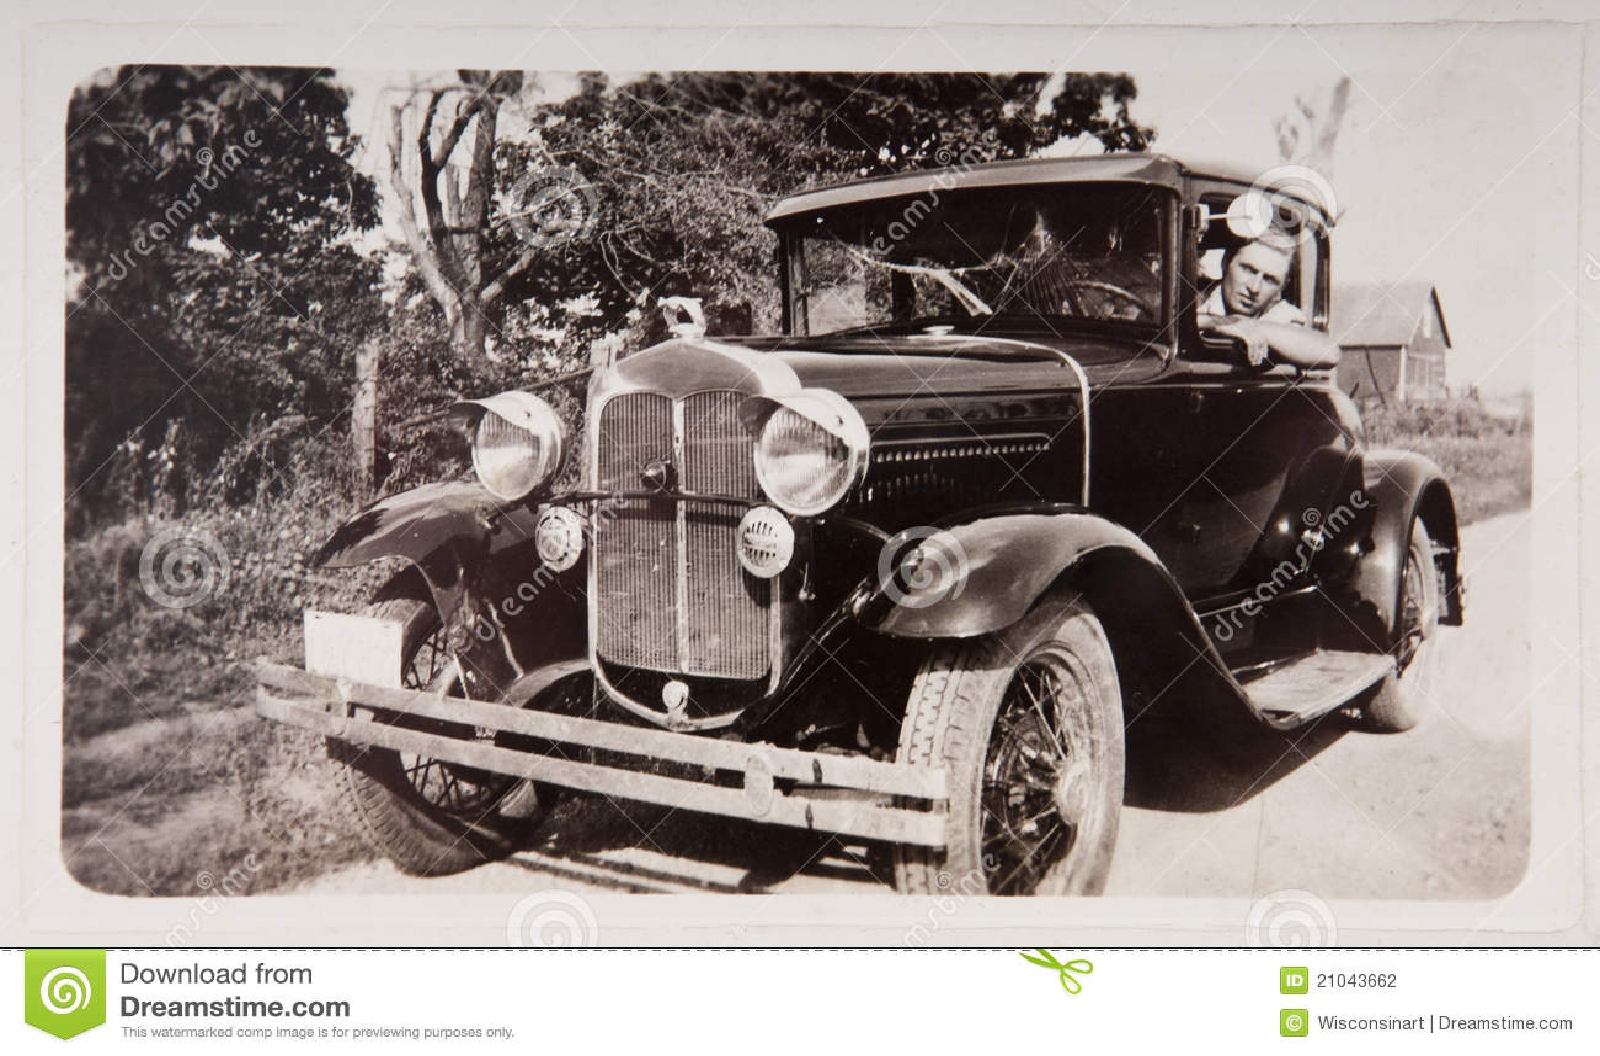 Coche viejo del modelo T del mecanismo impulsor del hombre joven de la fotografía de la vendimia